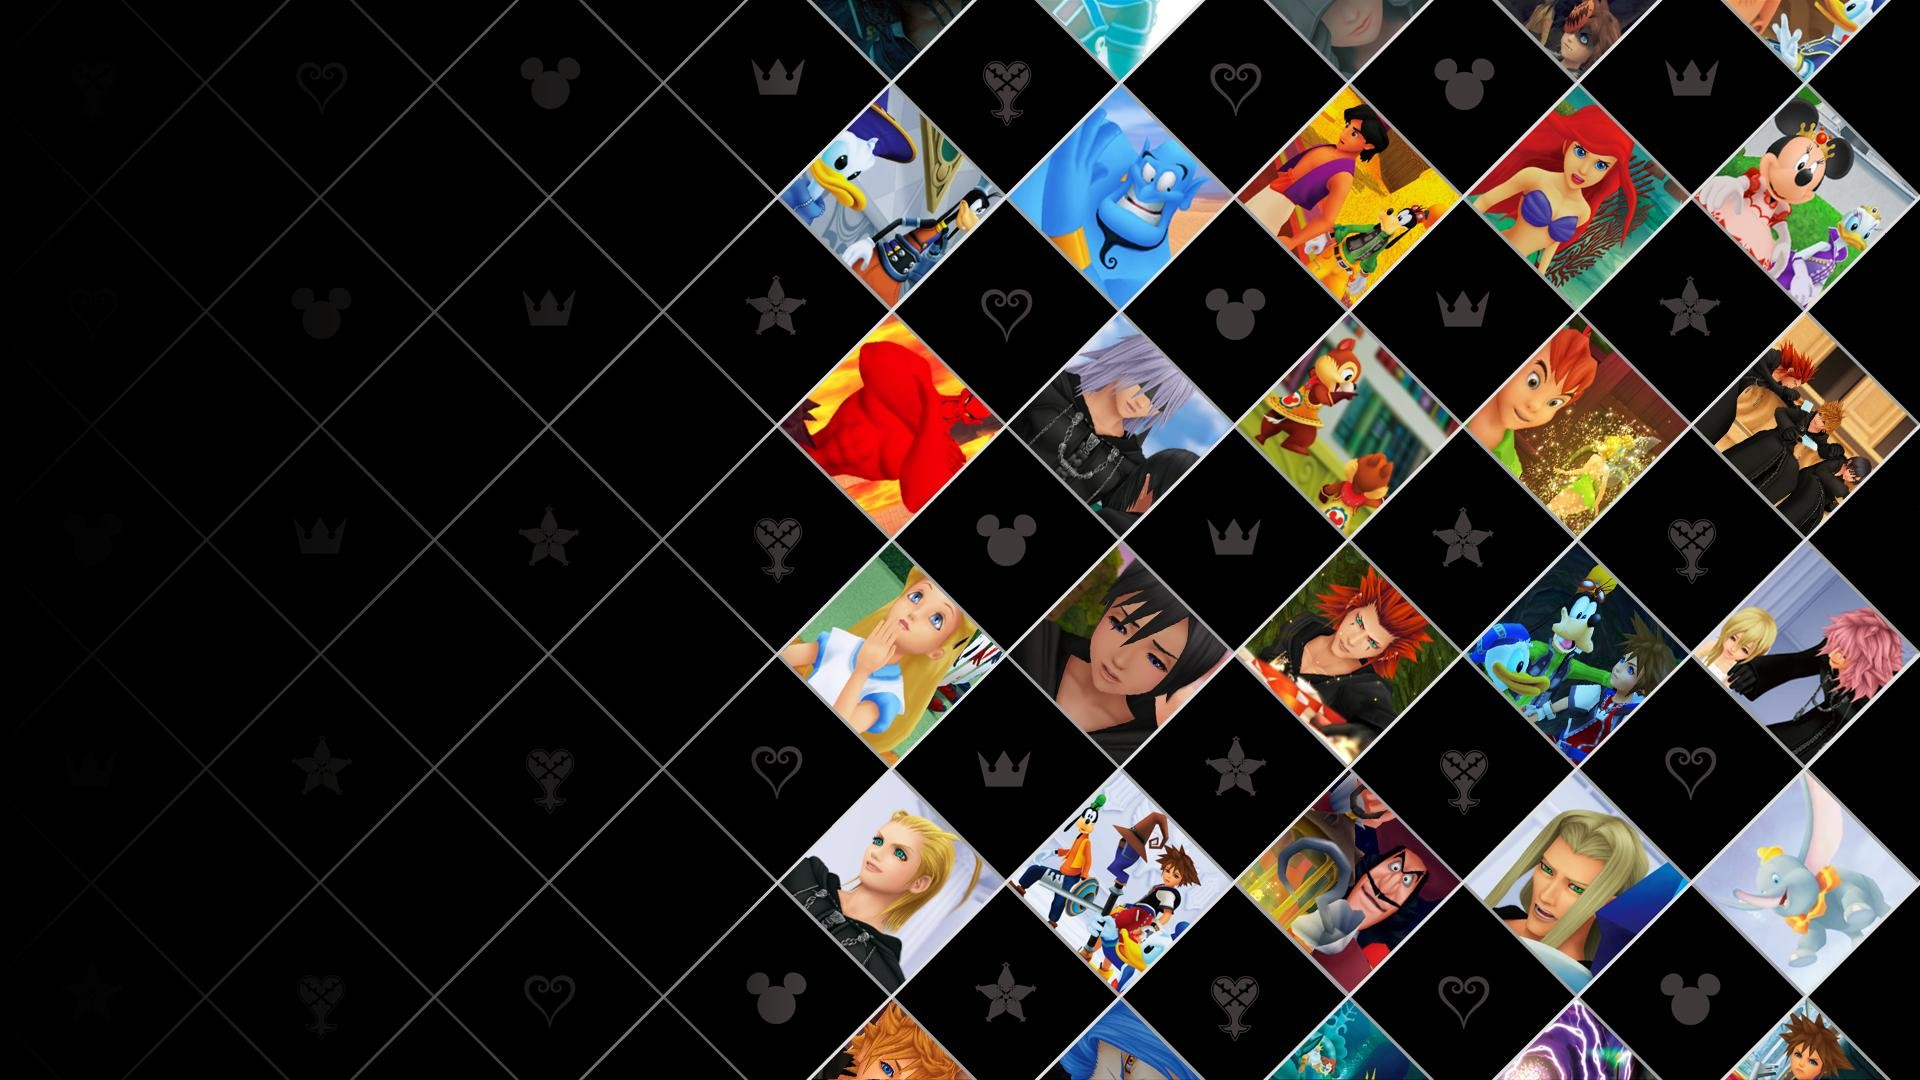 Kingdom Hearts Hd 1.5 Remix wallpaper 226031